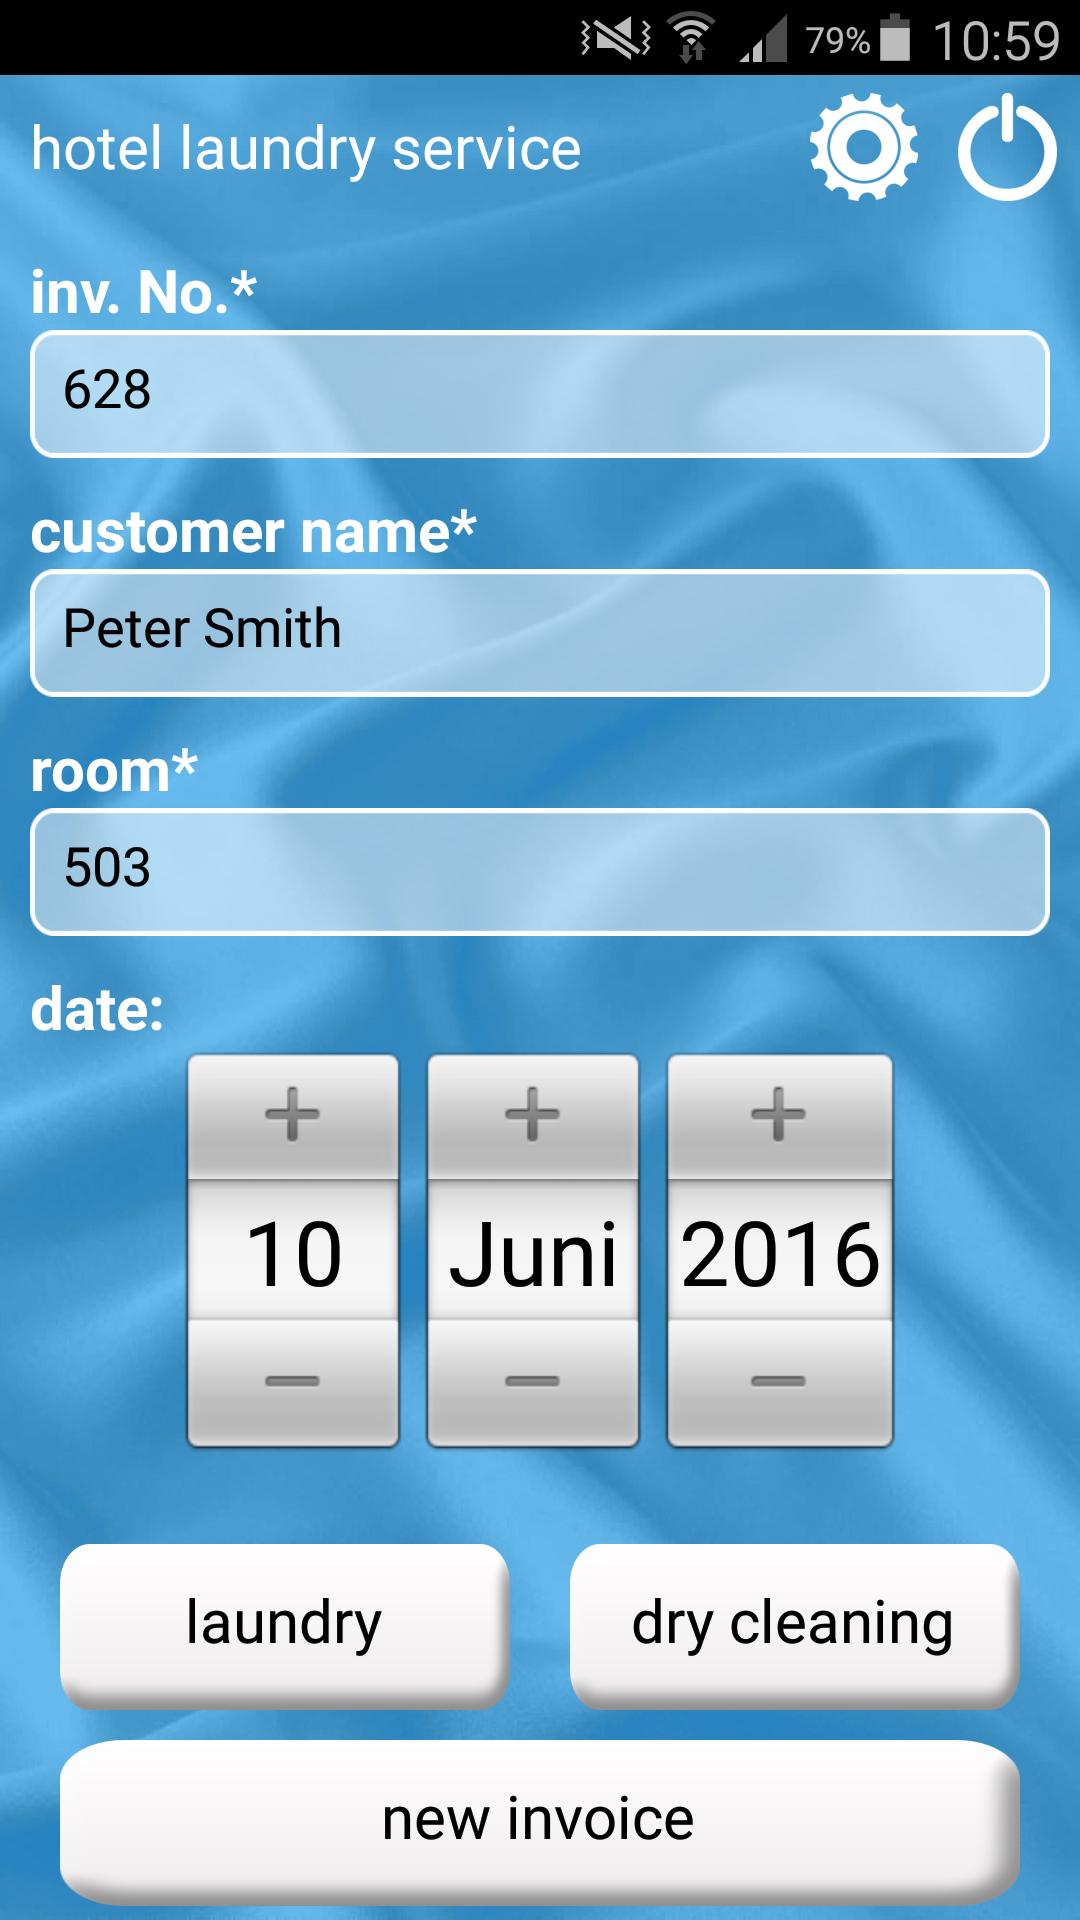 ginstr_app_hotelLaundryService_EN_2